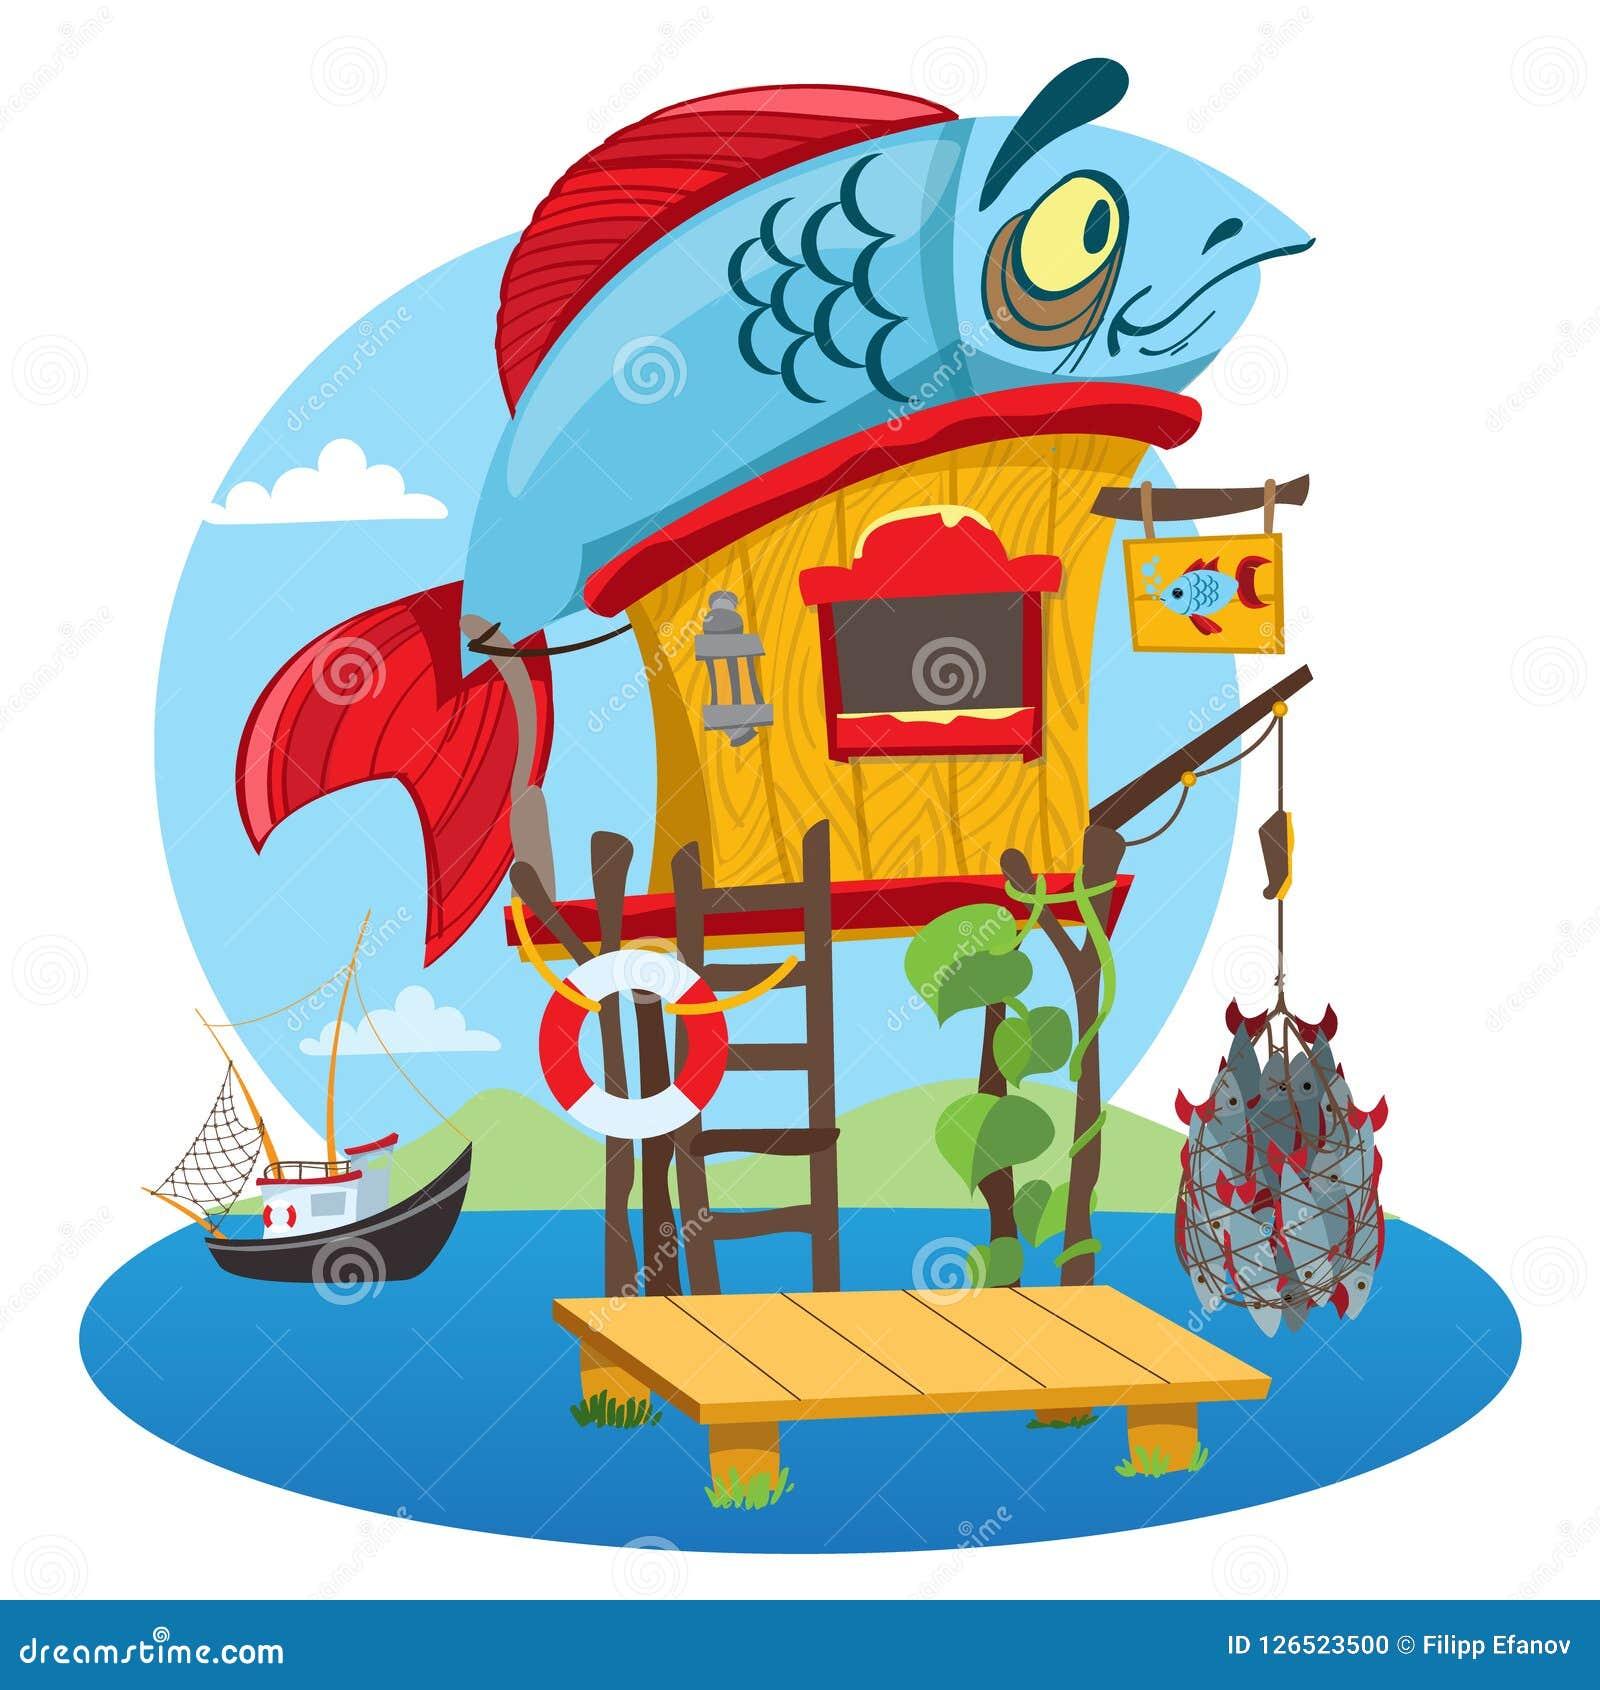 house fisherman cartoon illustration of a wooden hut on stilts near rh dreamstime com